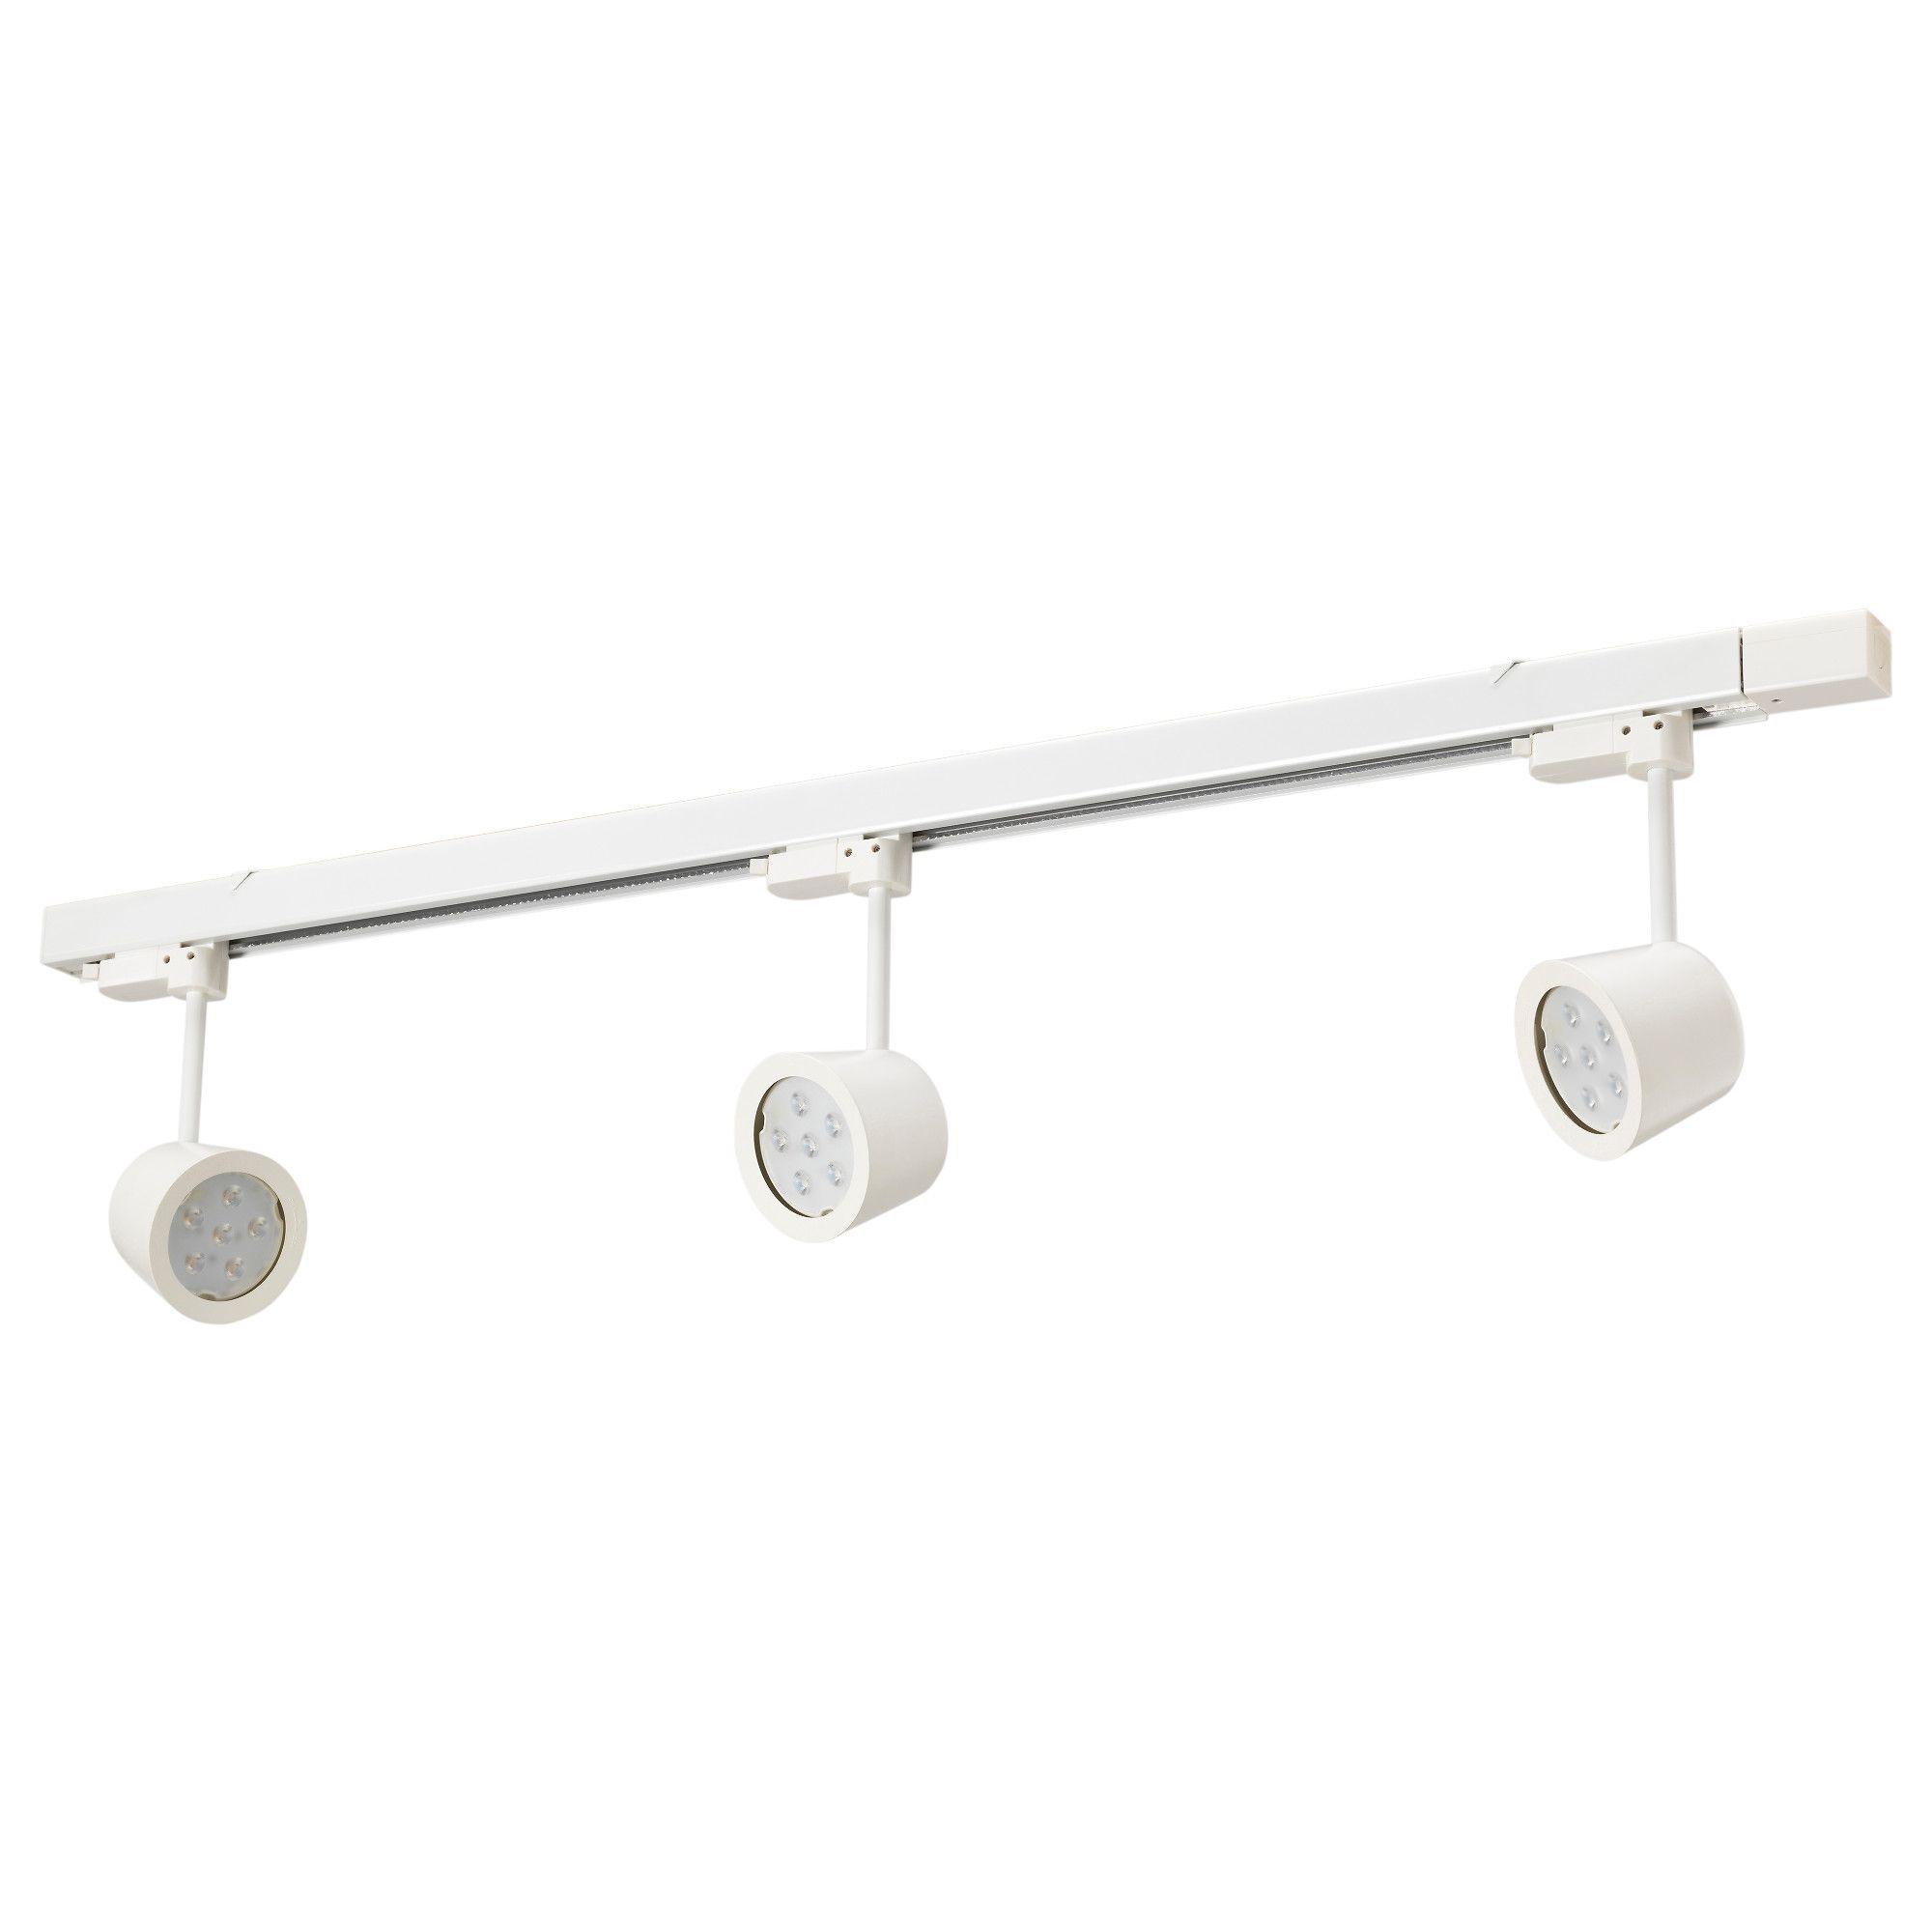 Skeninge Living Ceiling Lamps Ikea Ceiling Lamp Ikea Led